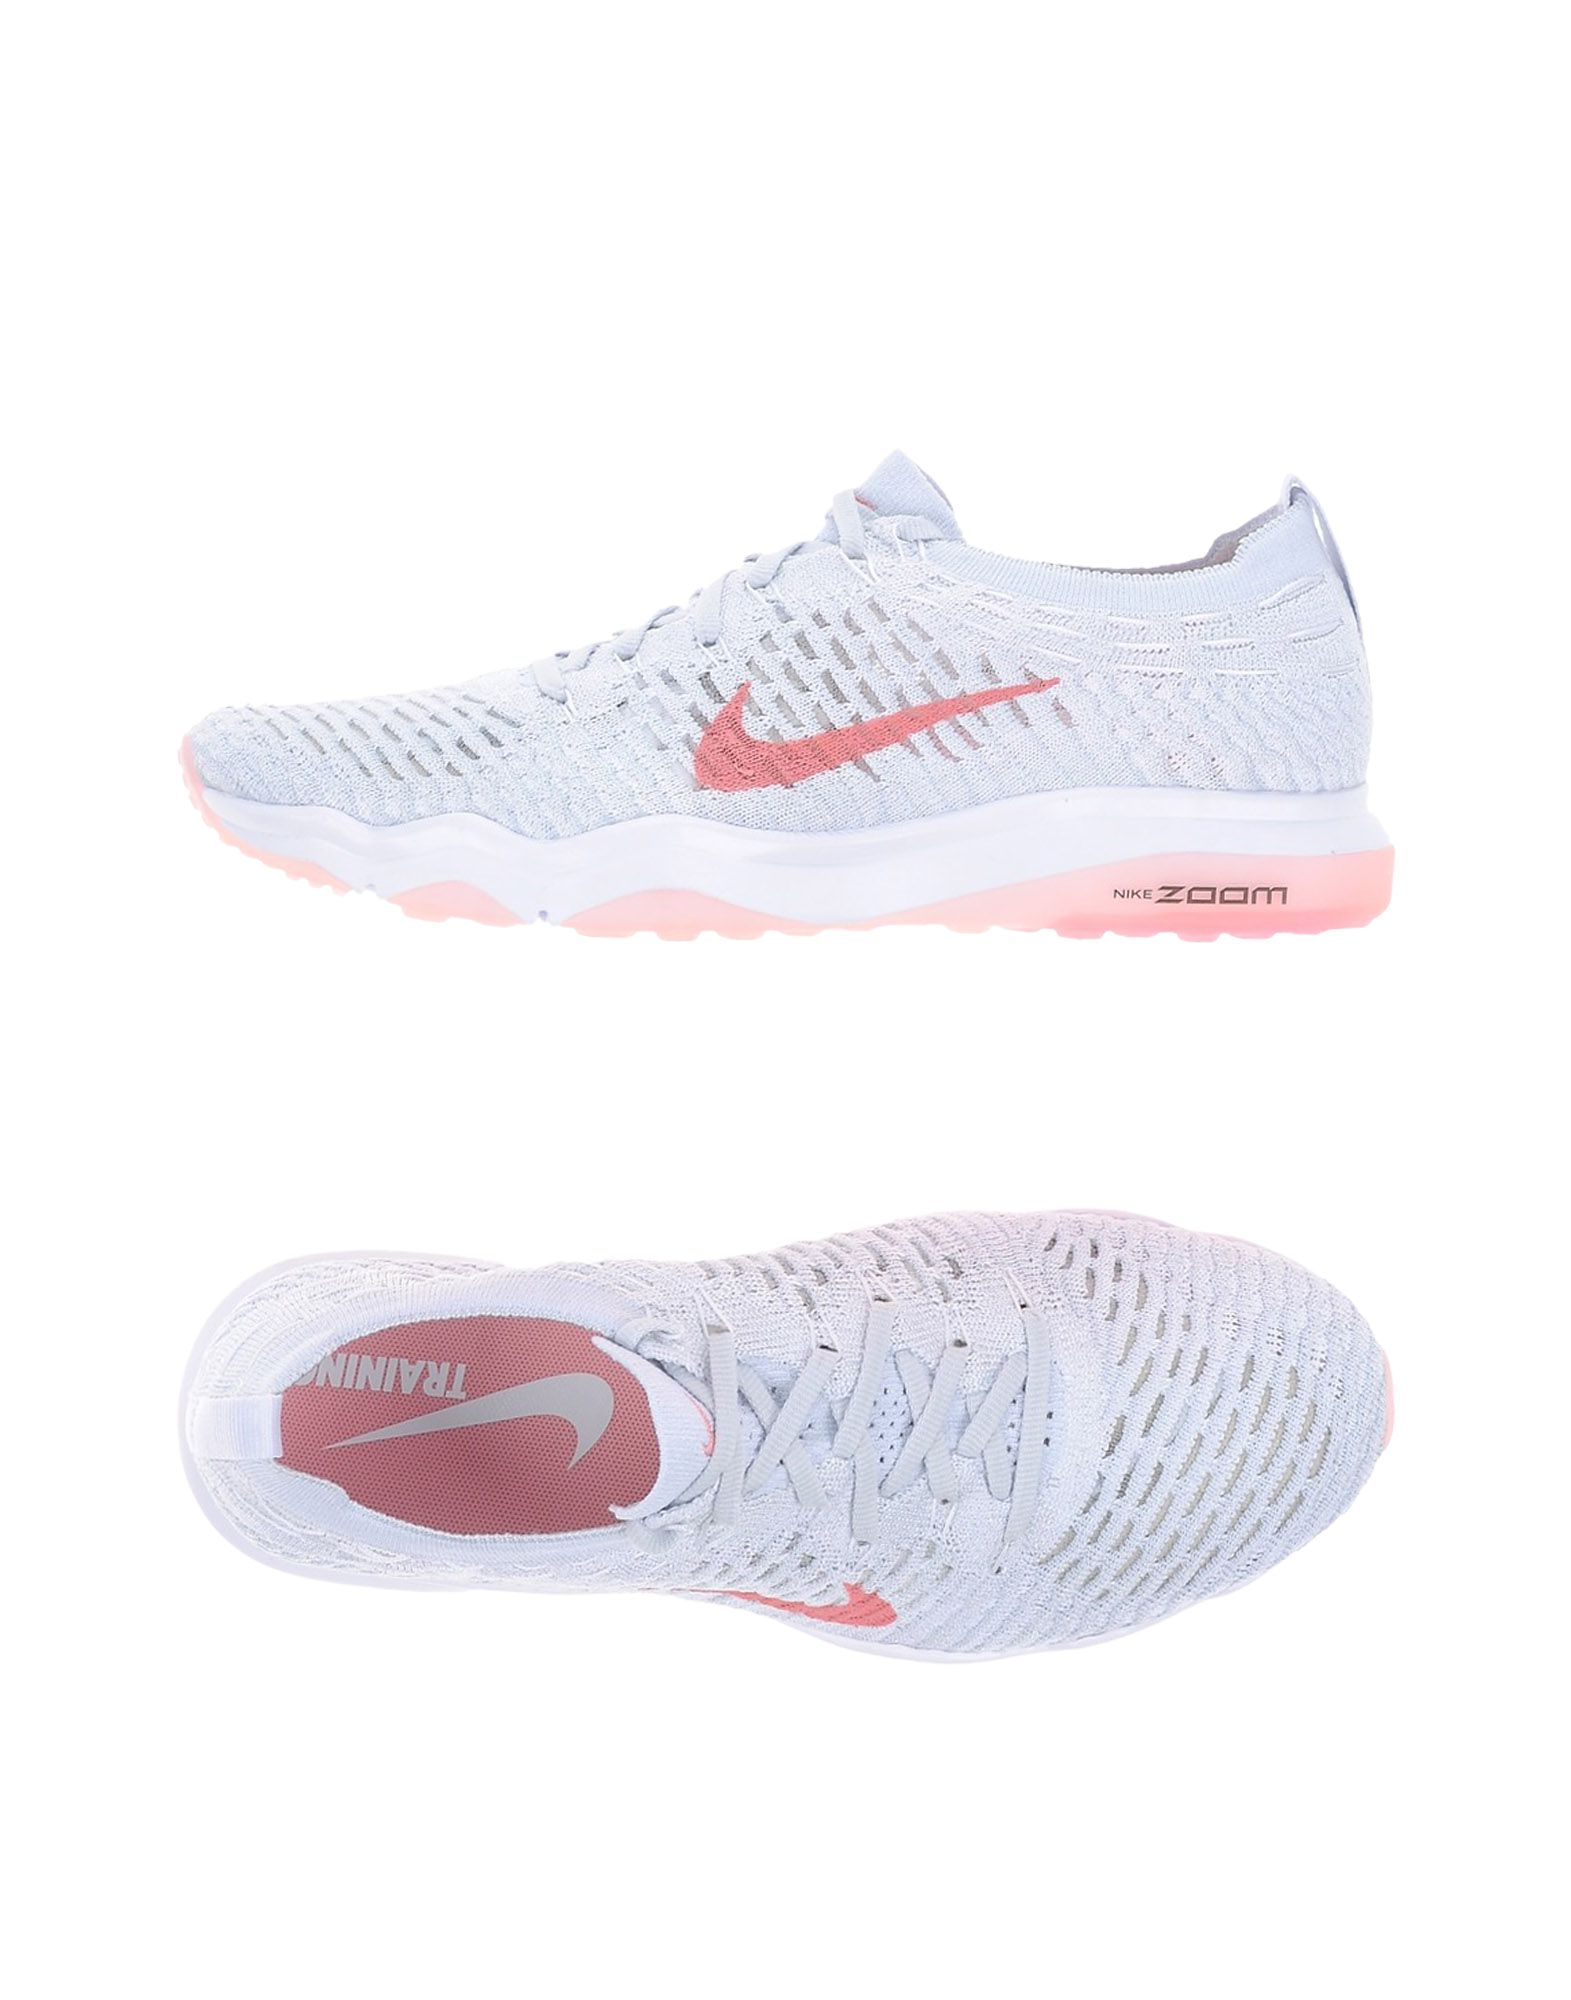 Turnschuhe Nike  Air Zoom Fearless Flyknit - damen - 11203056LU